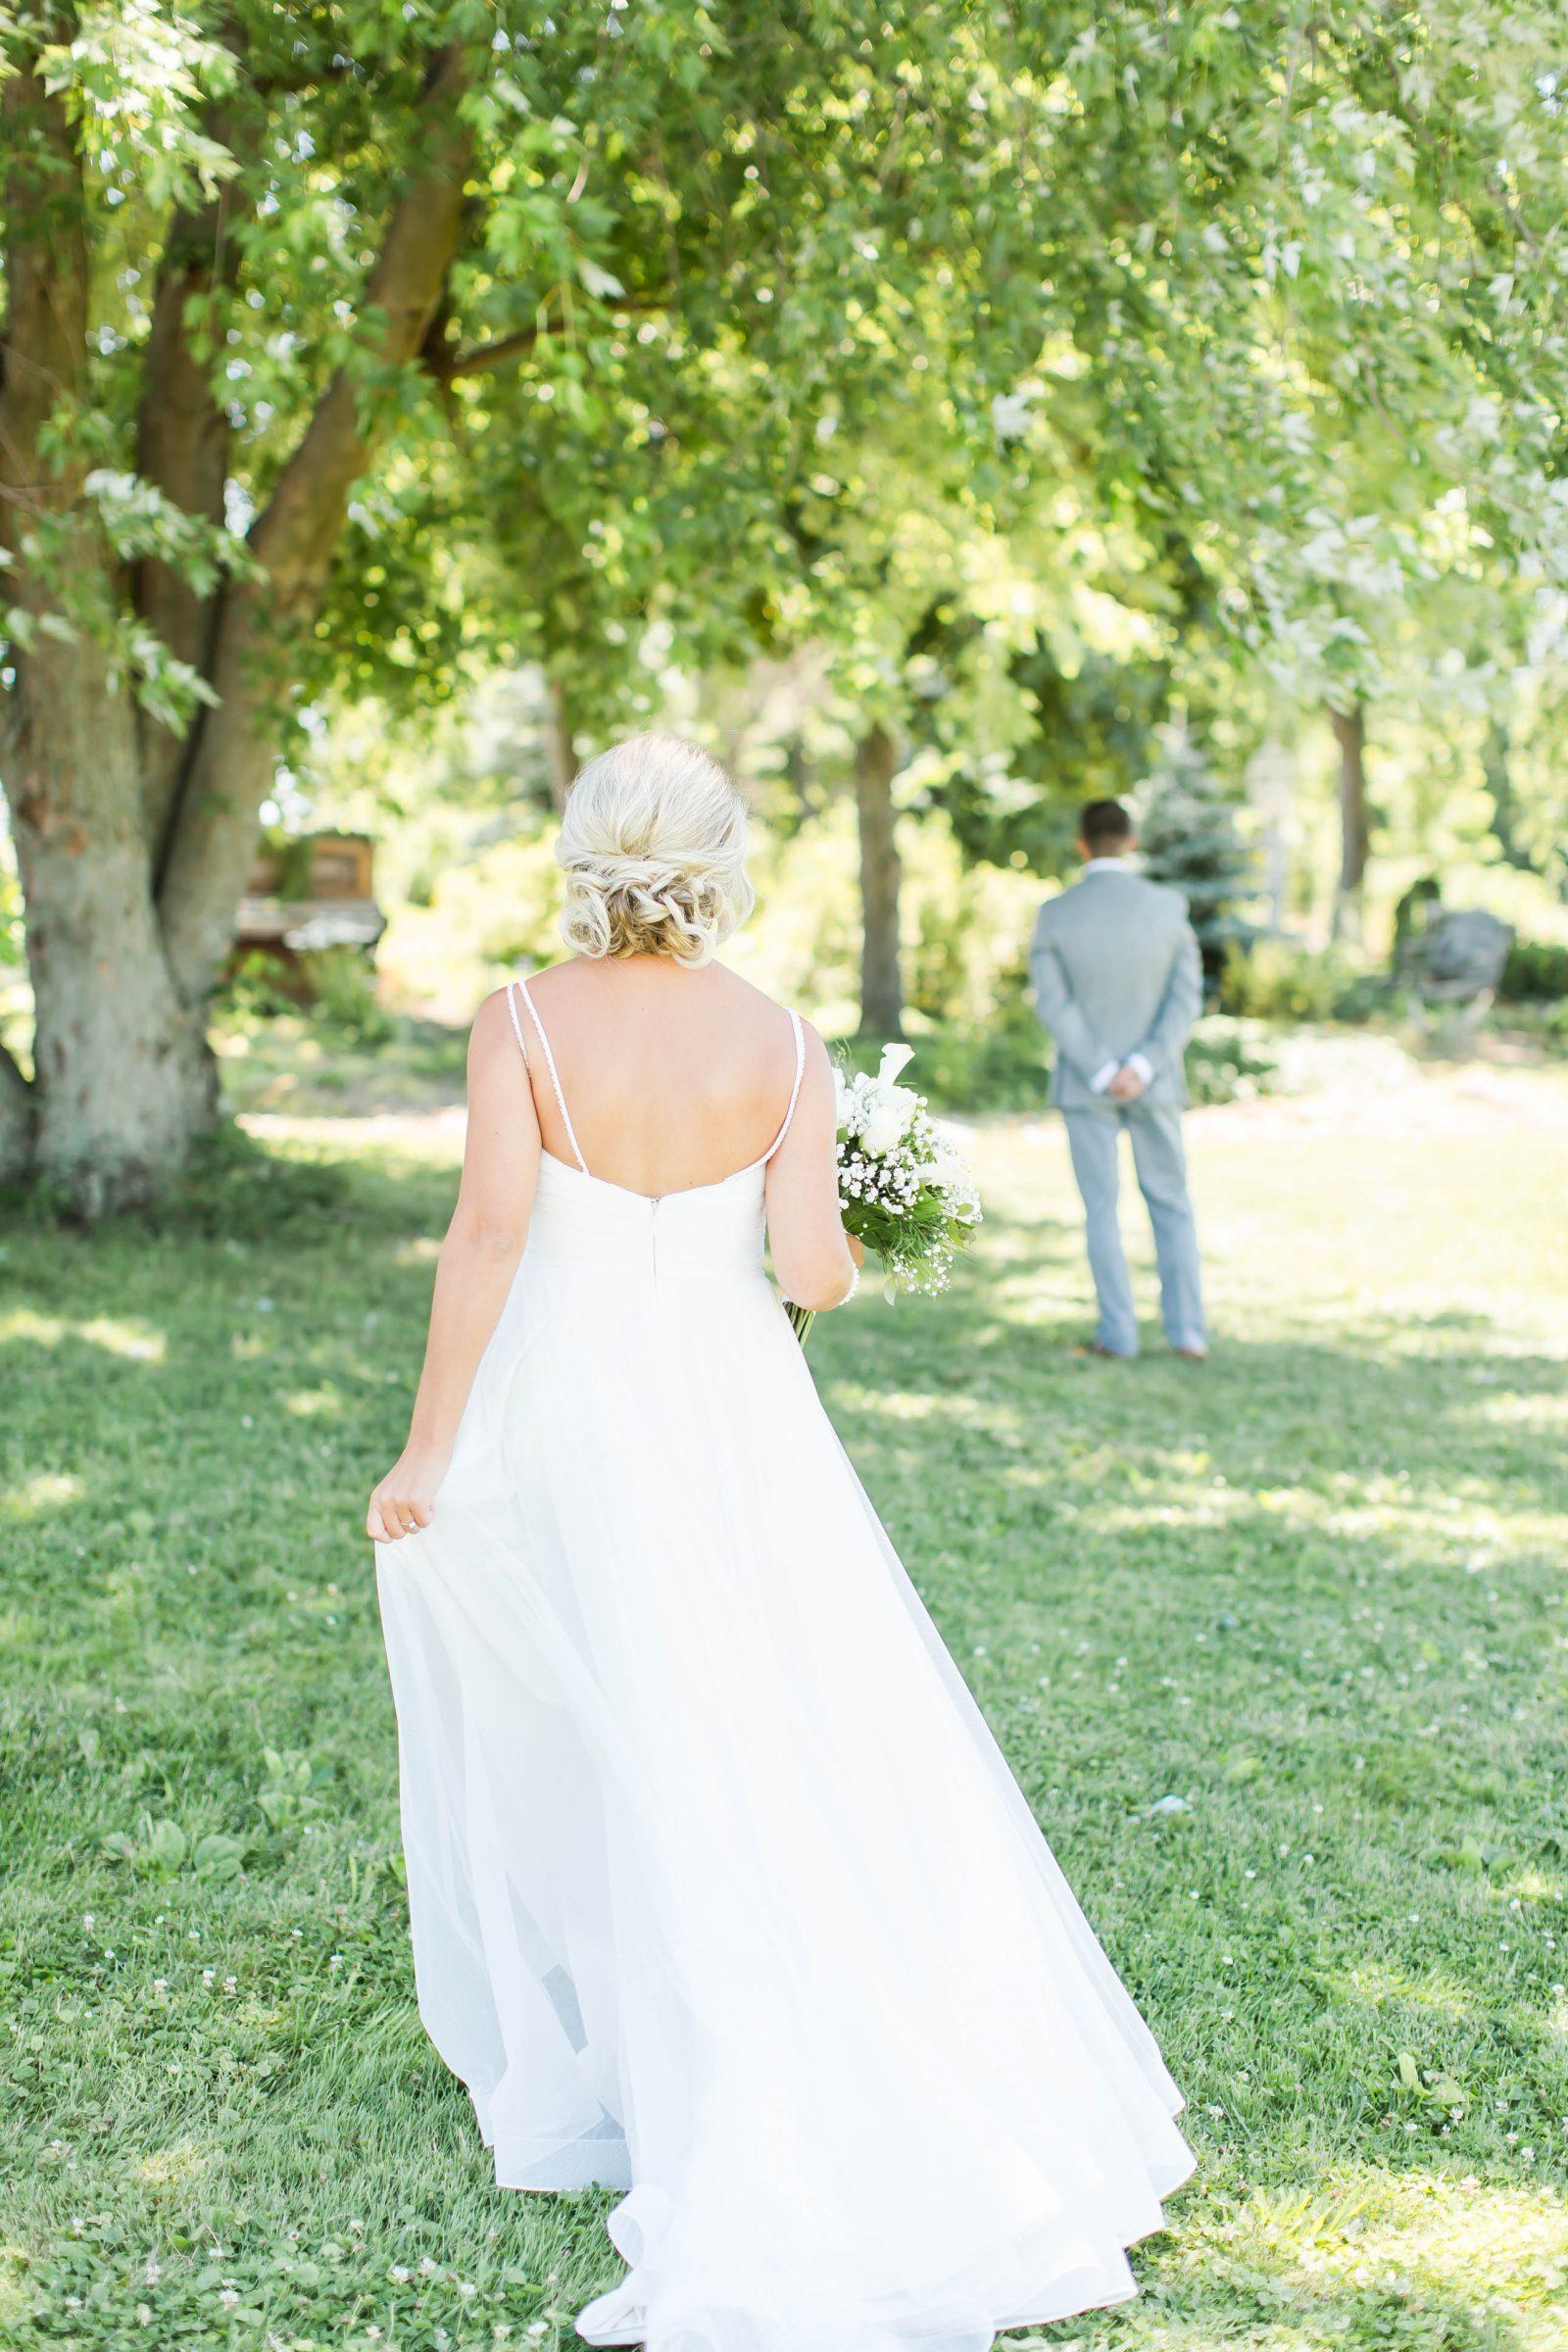 peacock-ridge-summer-wedding-photographer-akron-ohio-loren-jackson-photography-24